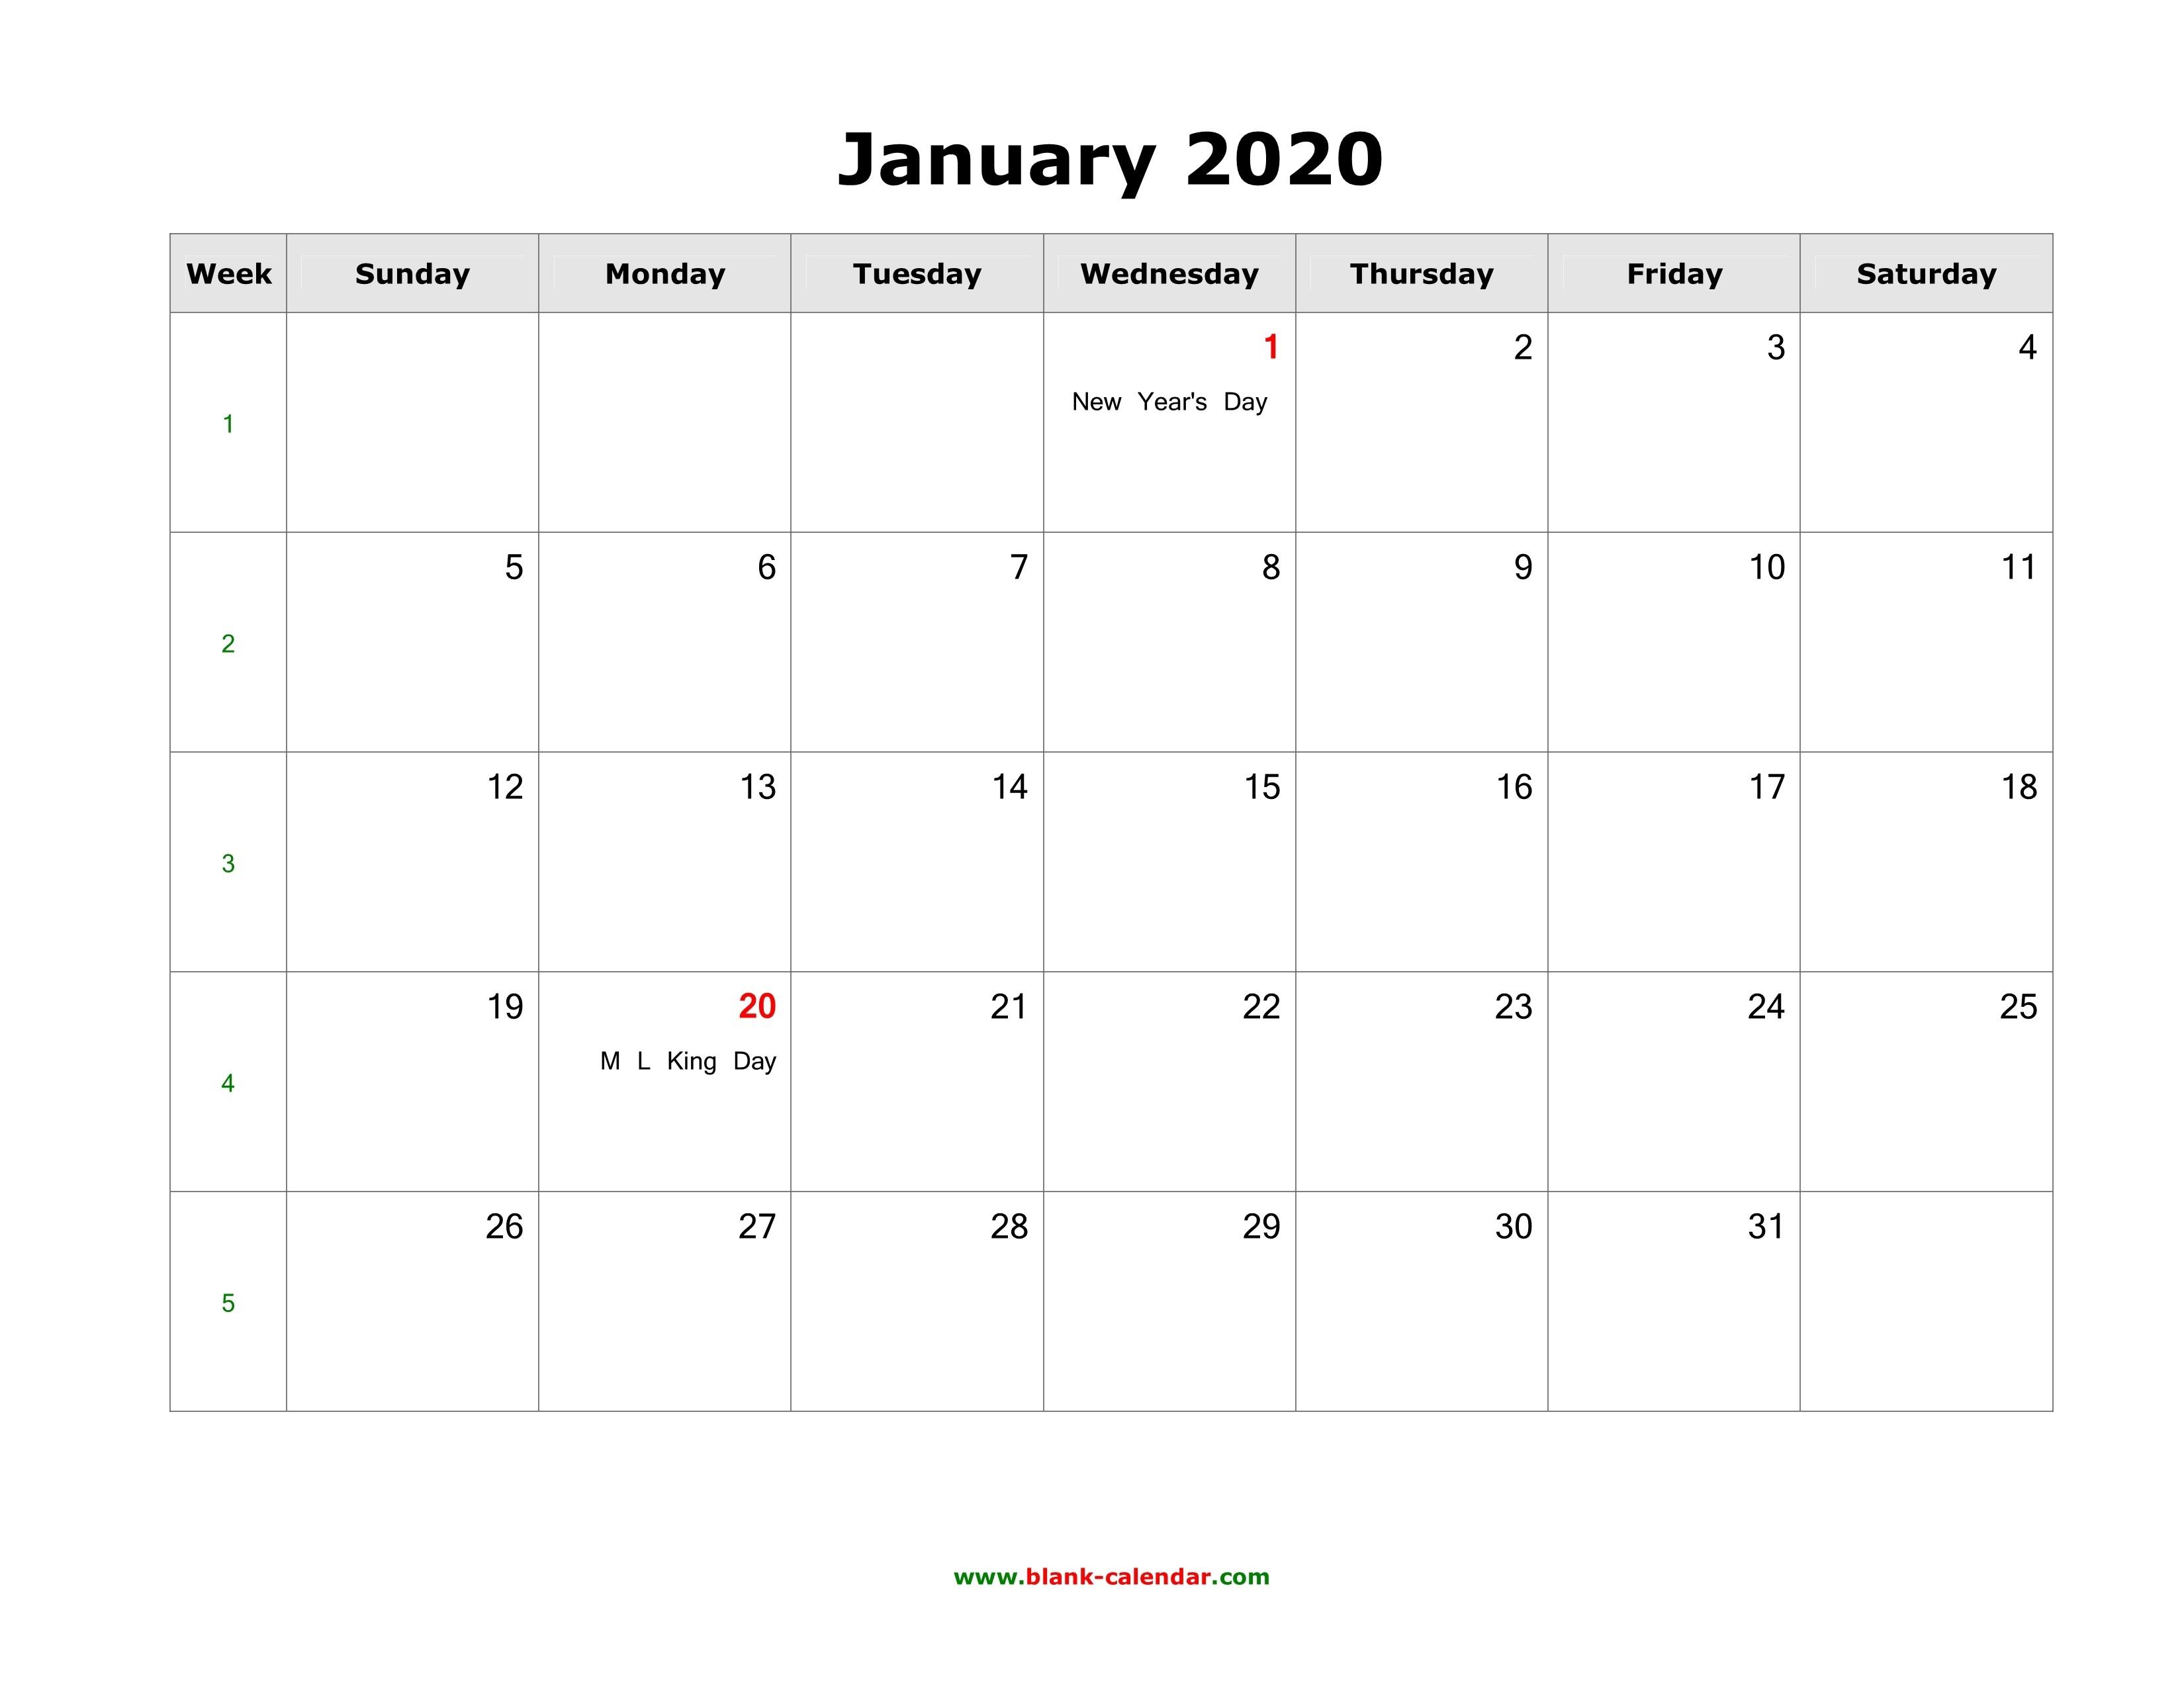 January 2020 Blank Calendar | Free Download Calendar Templates-January 2020 Calendar Vertical